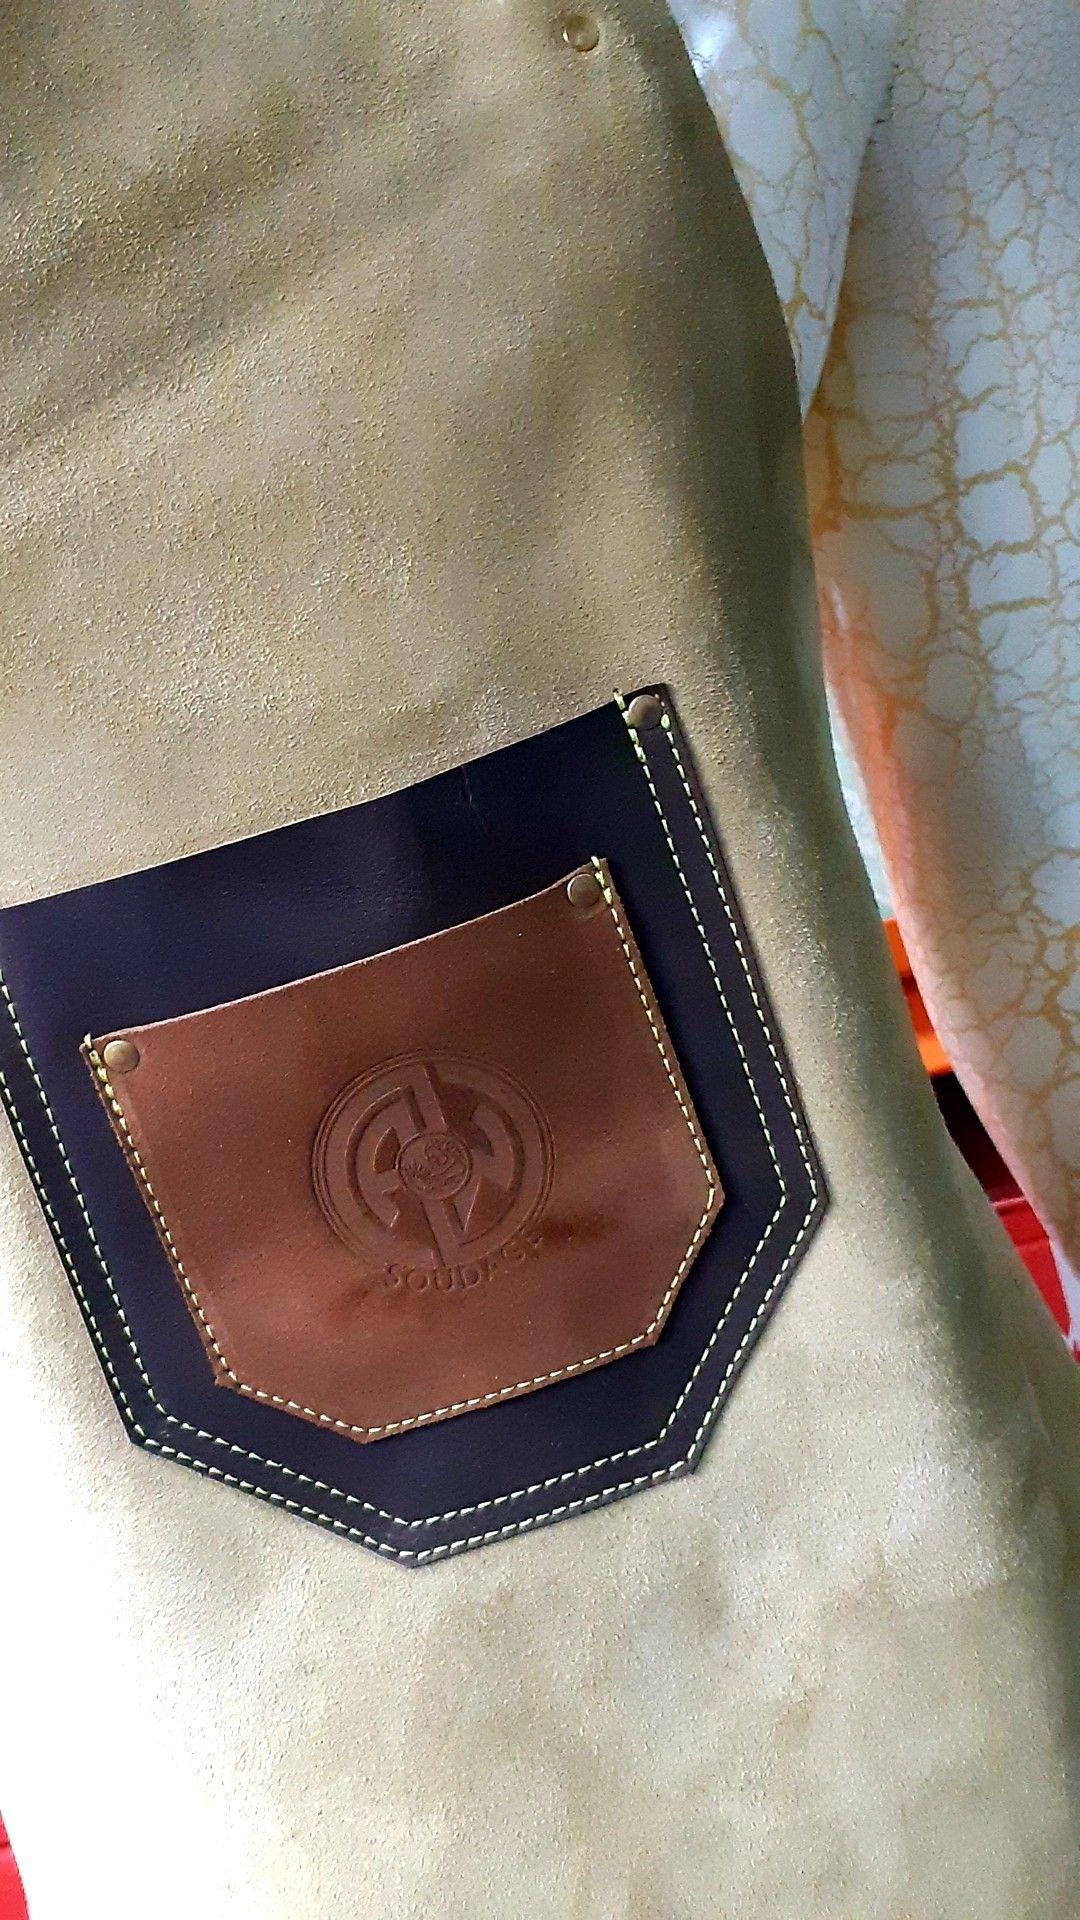 Pin by AW SOUDAGE on Tablier de soudeur Wallet, Fashion